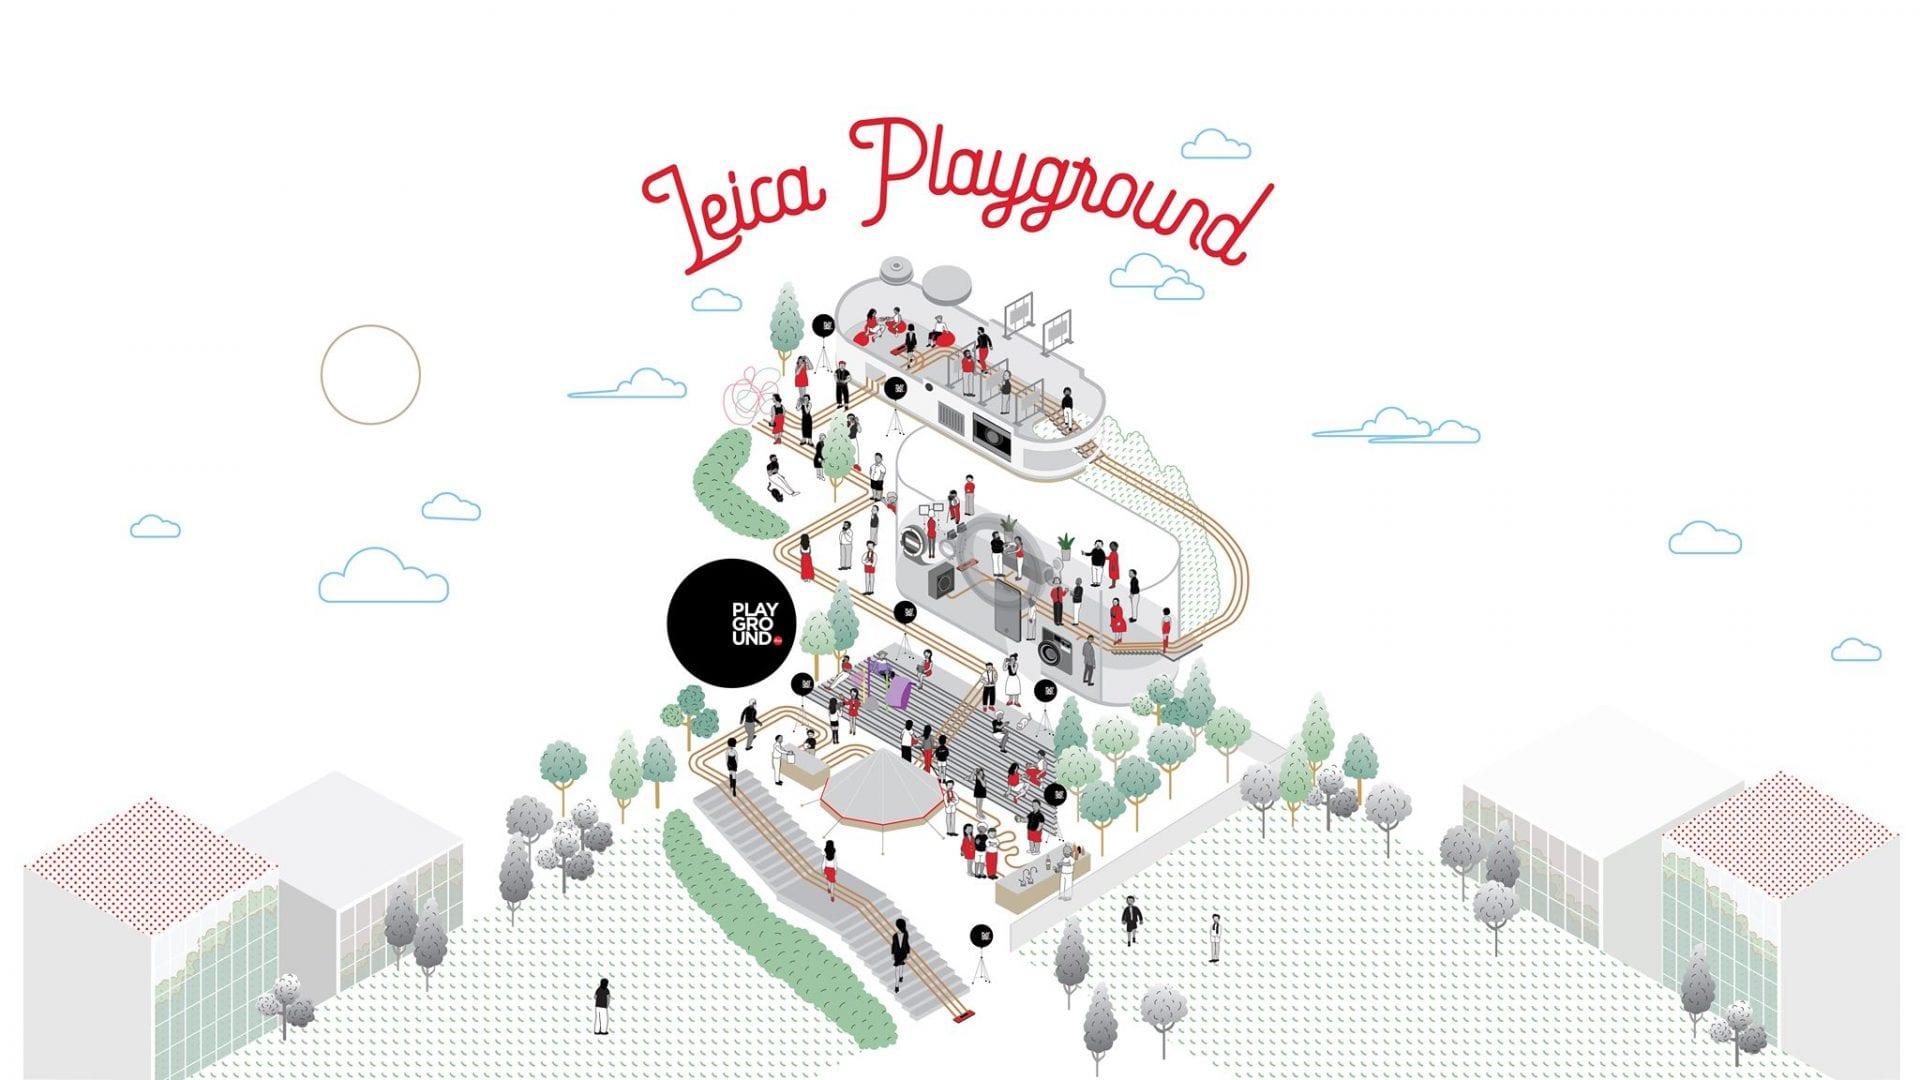 Leica Playground 2019